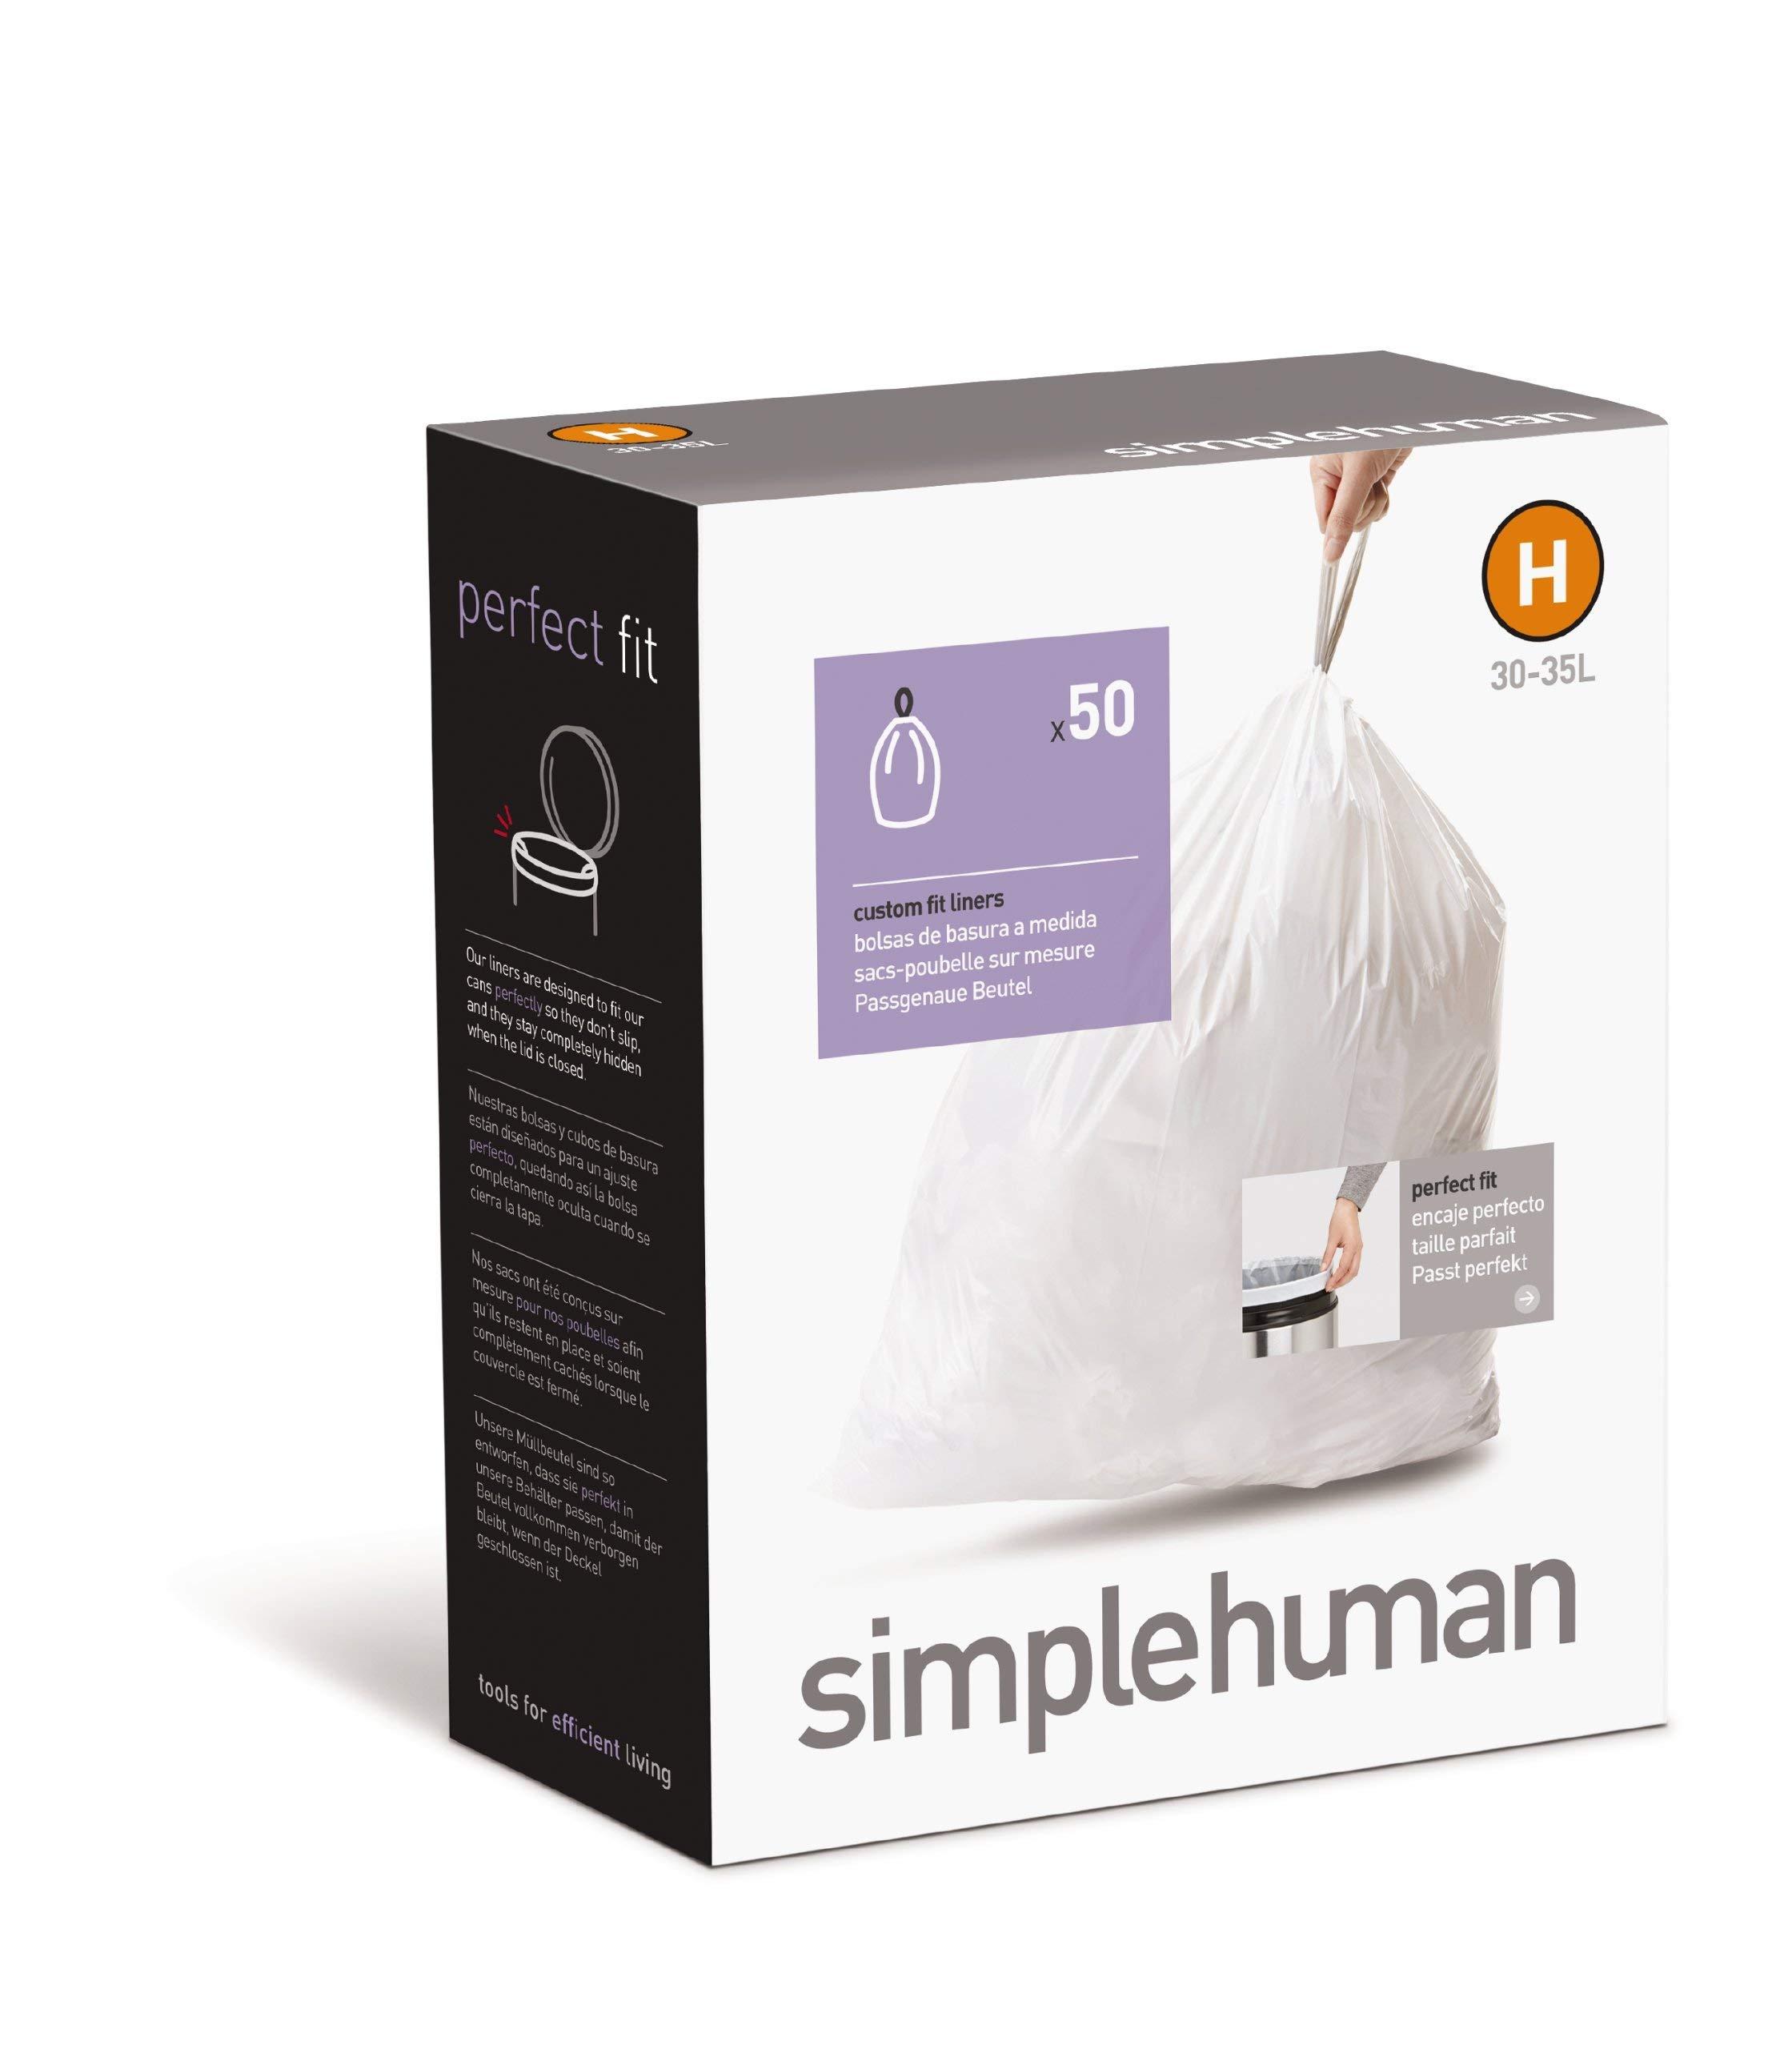 simplehuman Custom Fit Trash Can Liner H, 30-35 L / 8-9 Gal, 50-Count Box